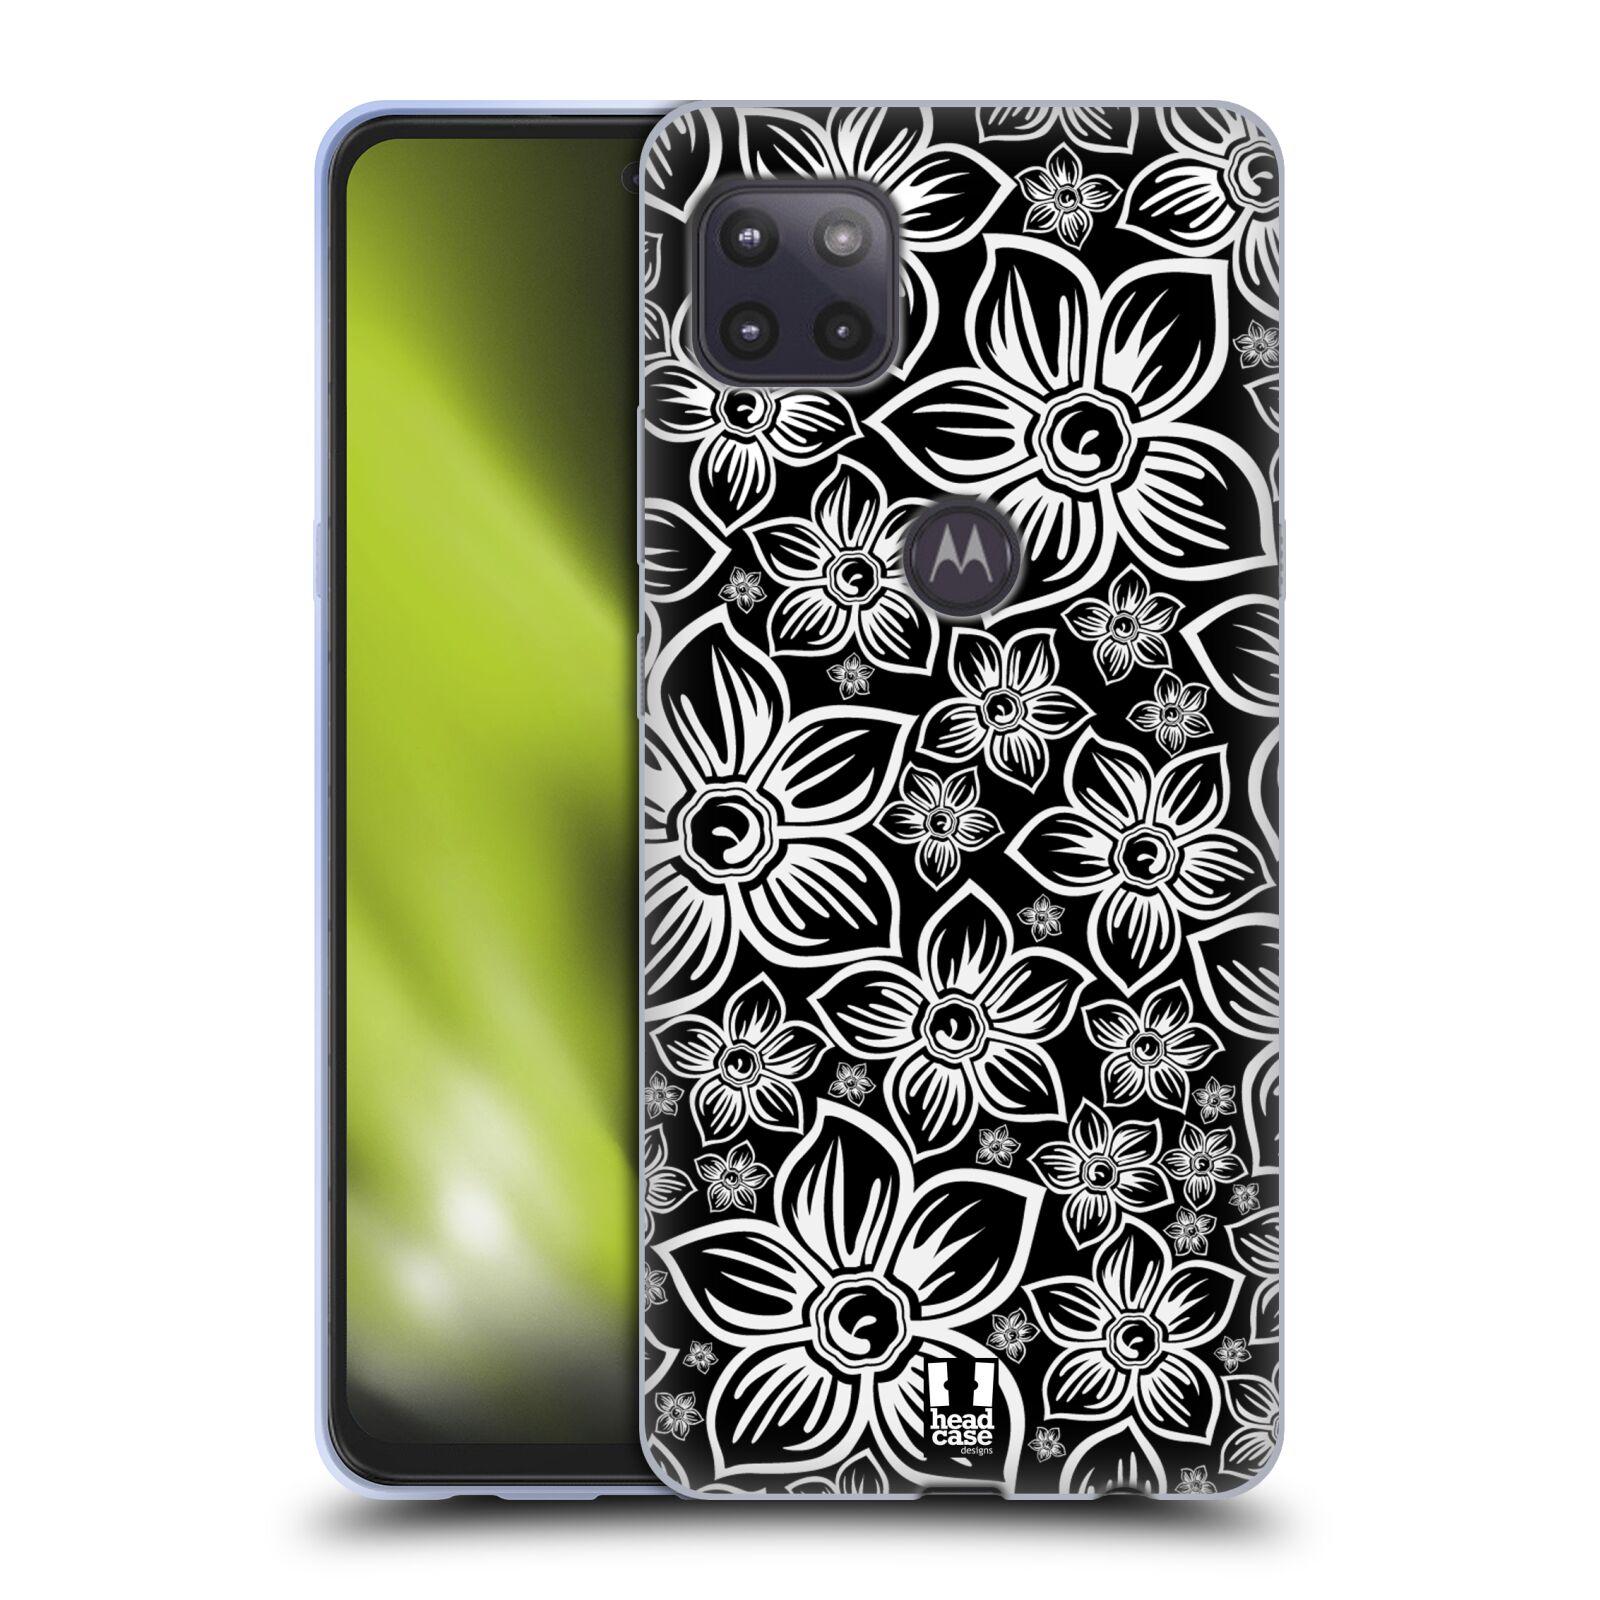 Silikonové pouzdro na mobil Motorola Moto G 5G - Head Case - FLORAL DAISY